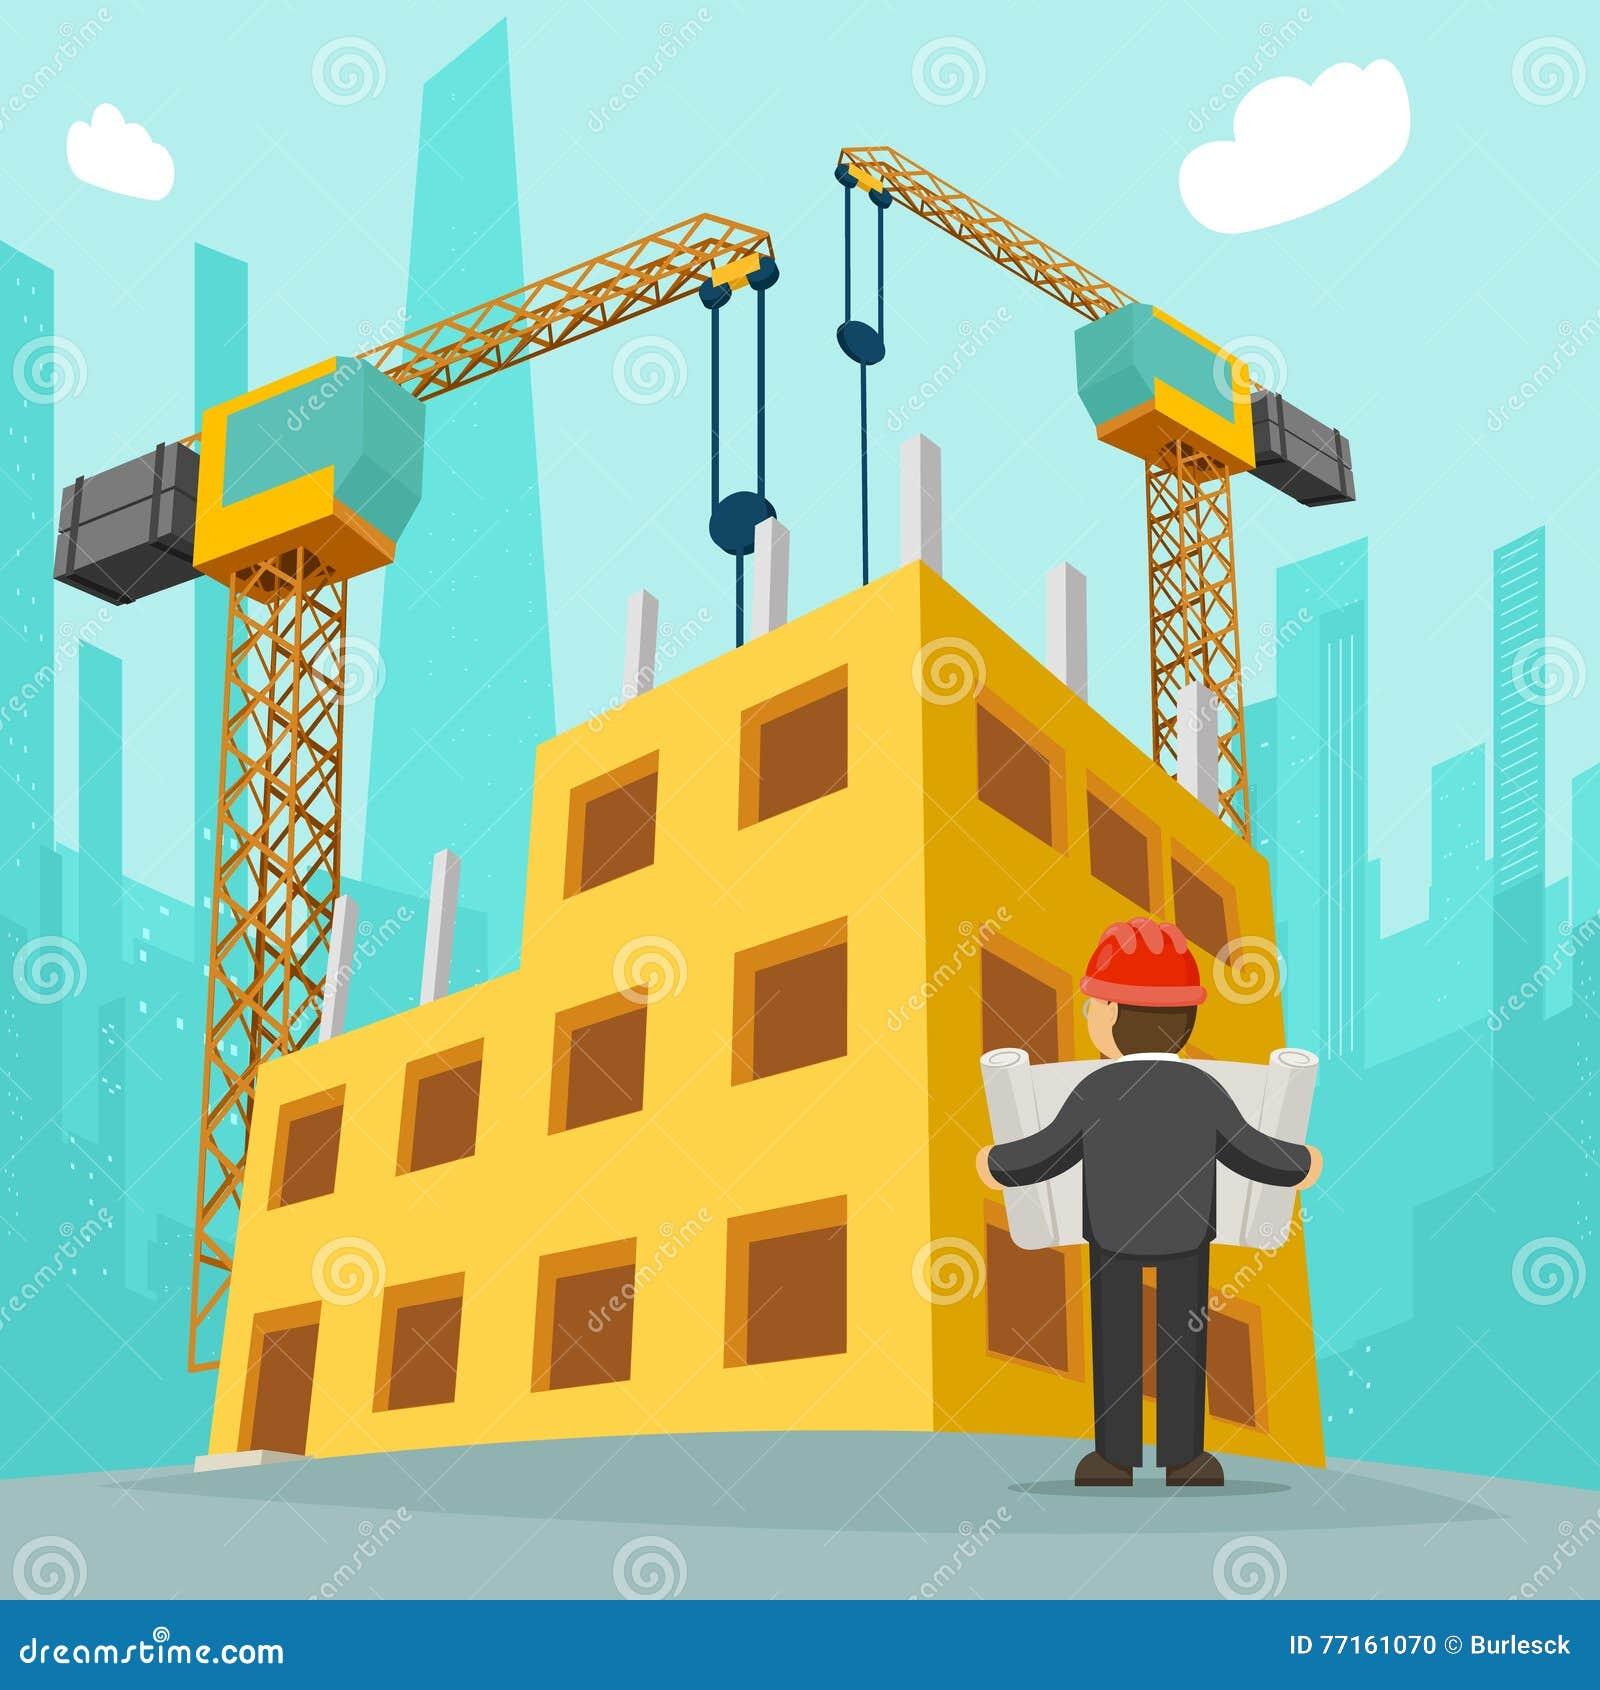 Building Construction Cartoon : Building construction cartoon vector illustration stock